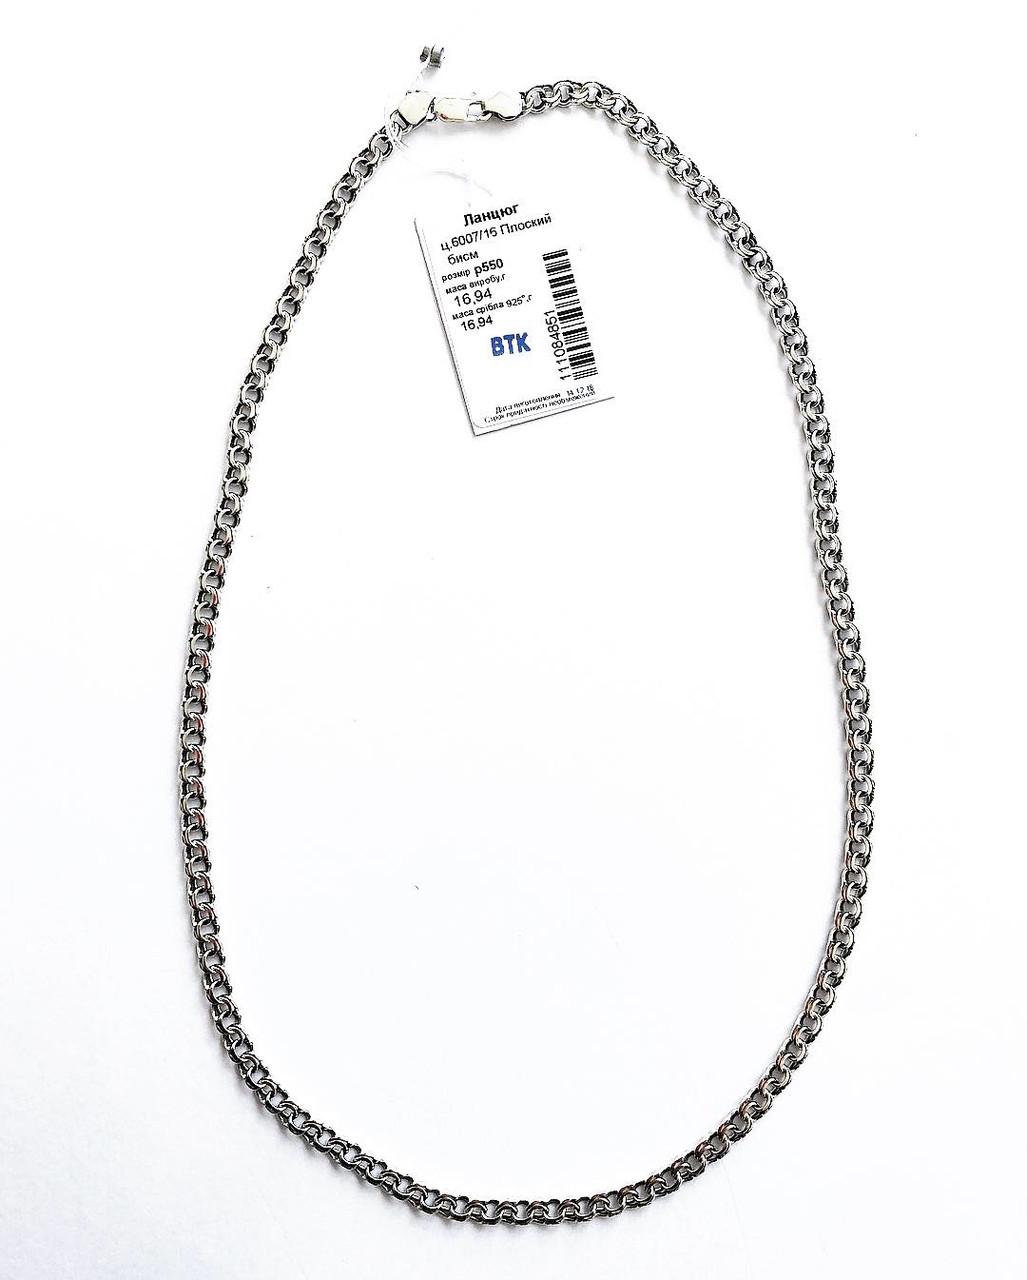 Мужская цепочка из серебра Элис бисмарк 55 см